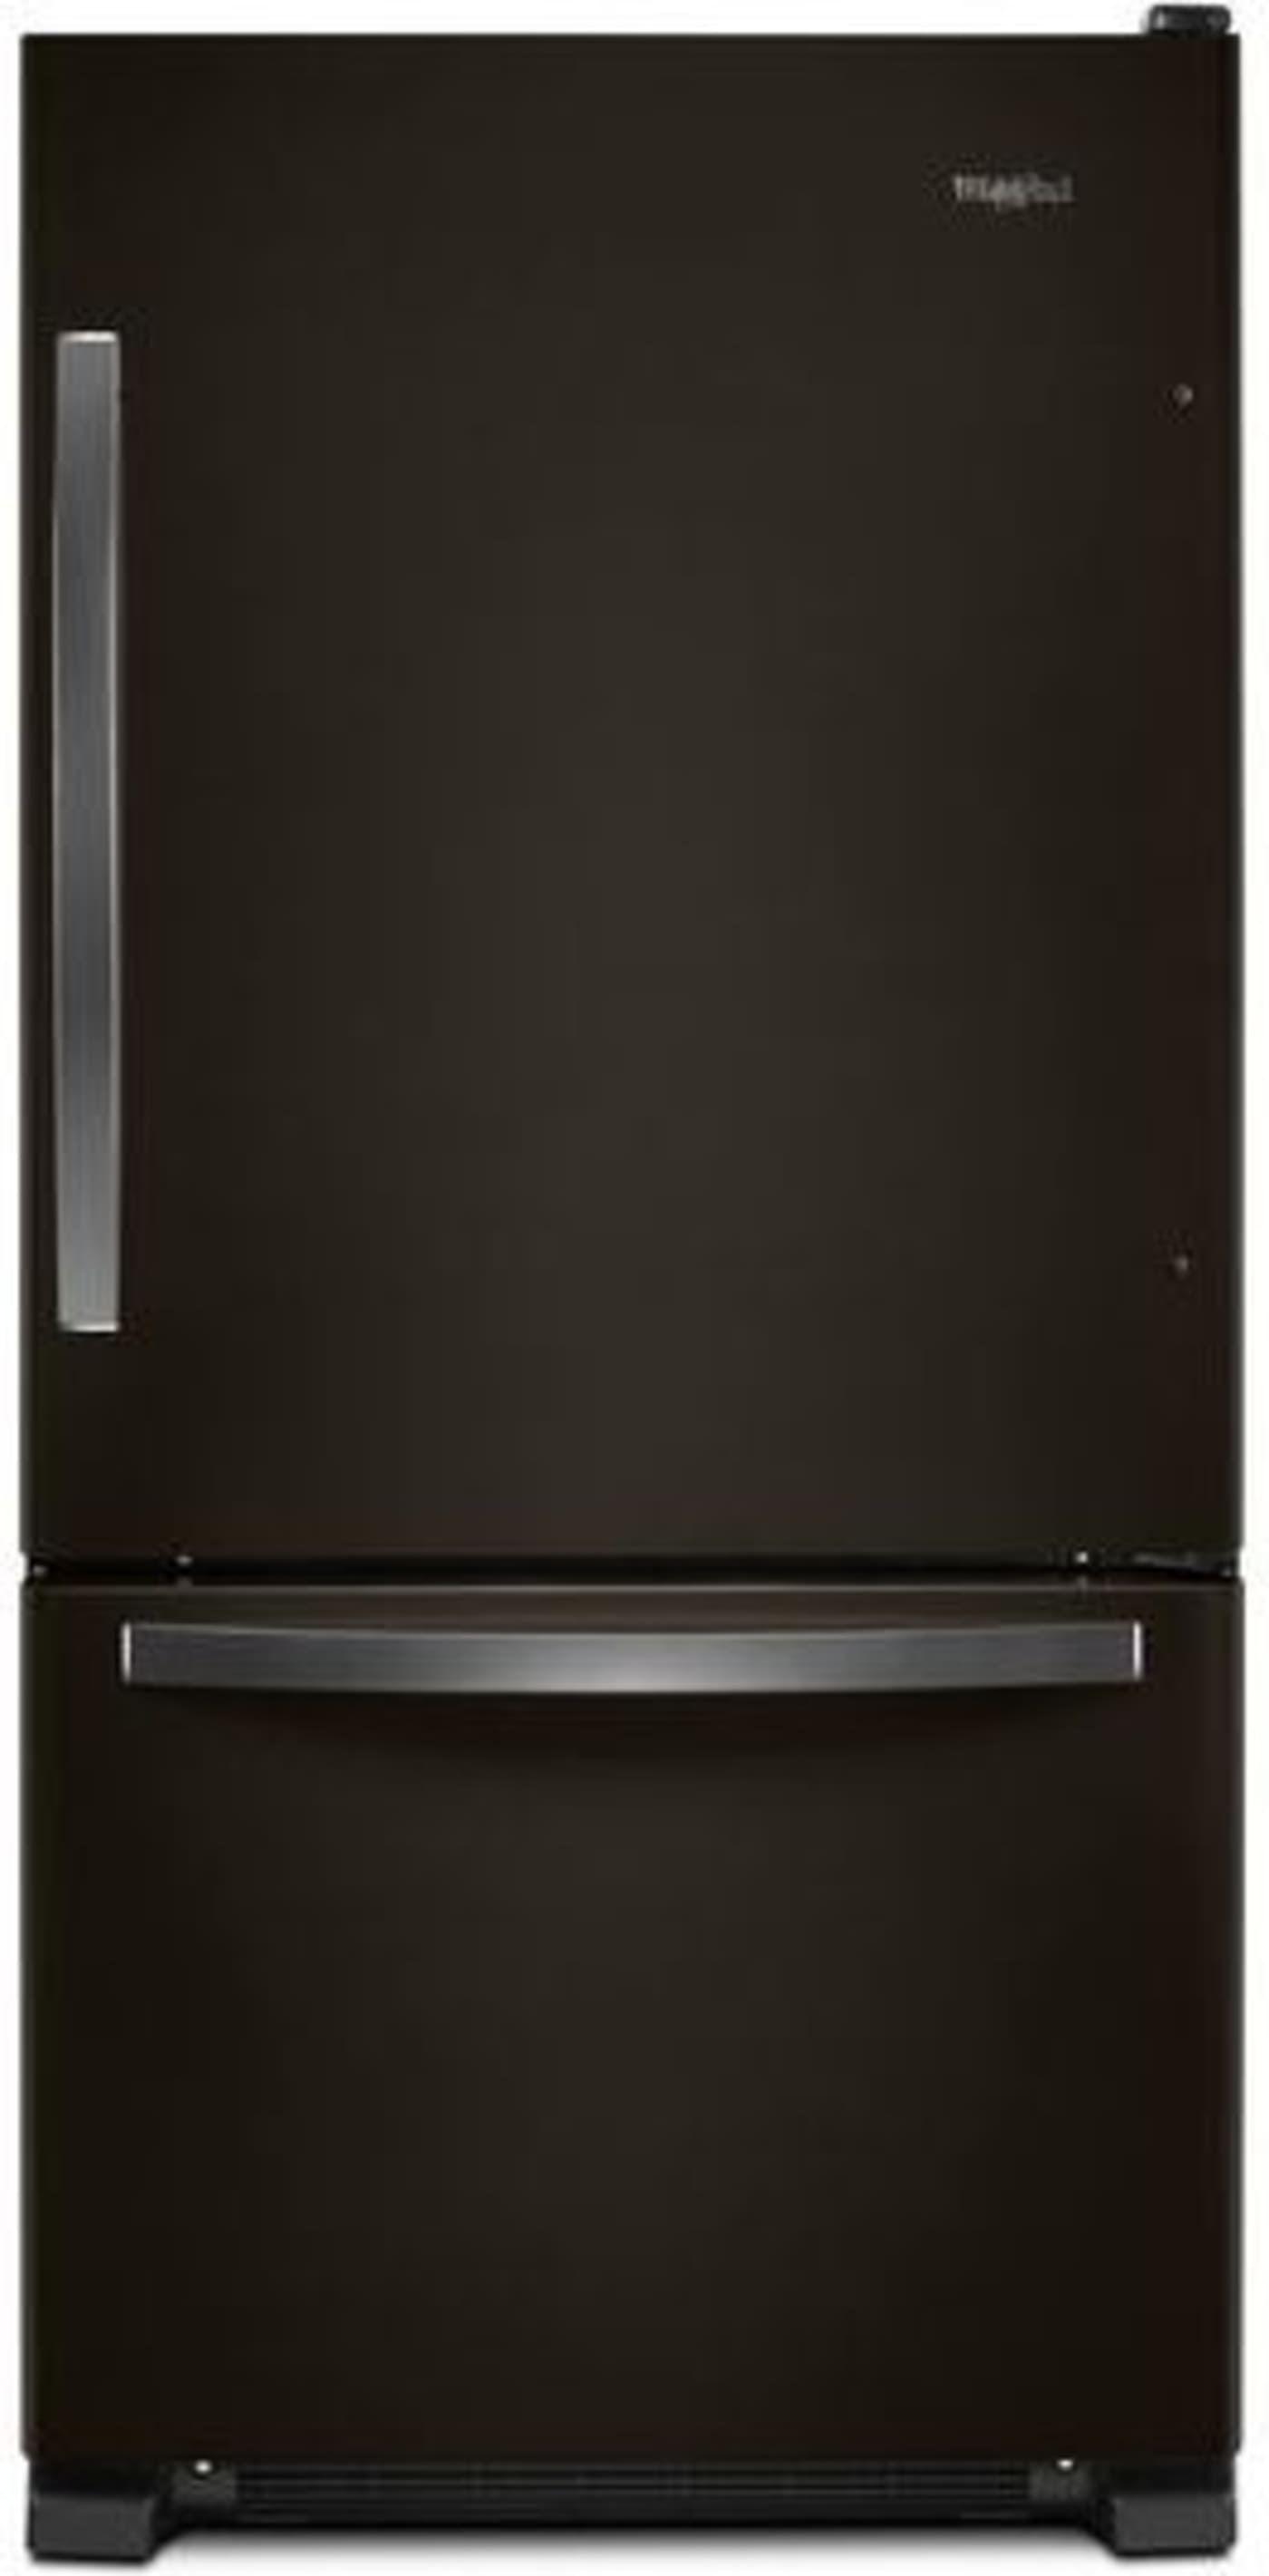 Wrb322dmhv By Whirlpool Bottom Freezer Refrigerators Goedekers Com Bottom Freezer Refrigerator Whirlpool